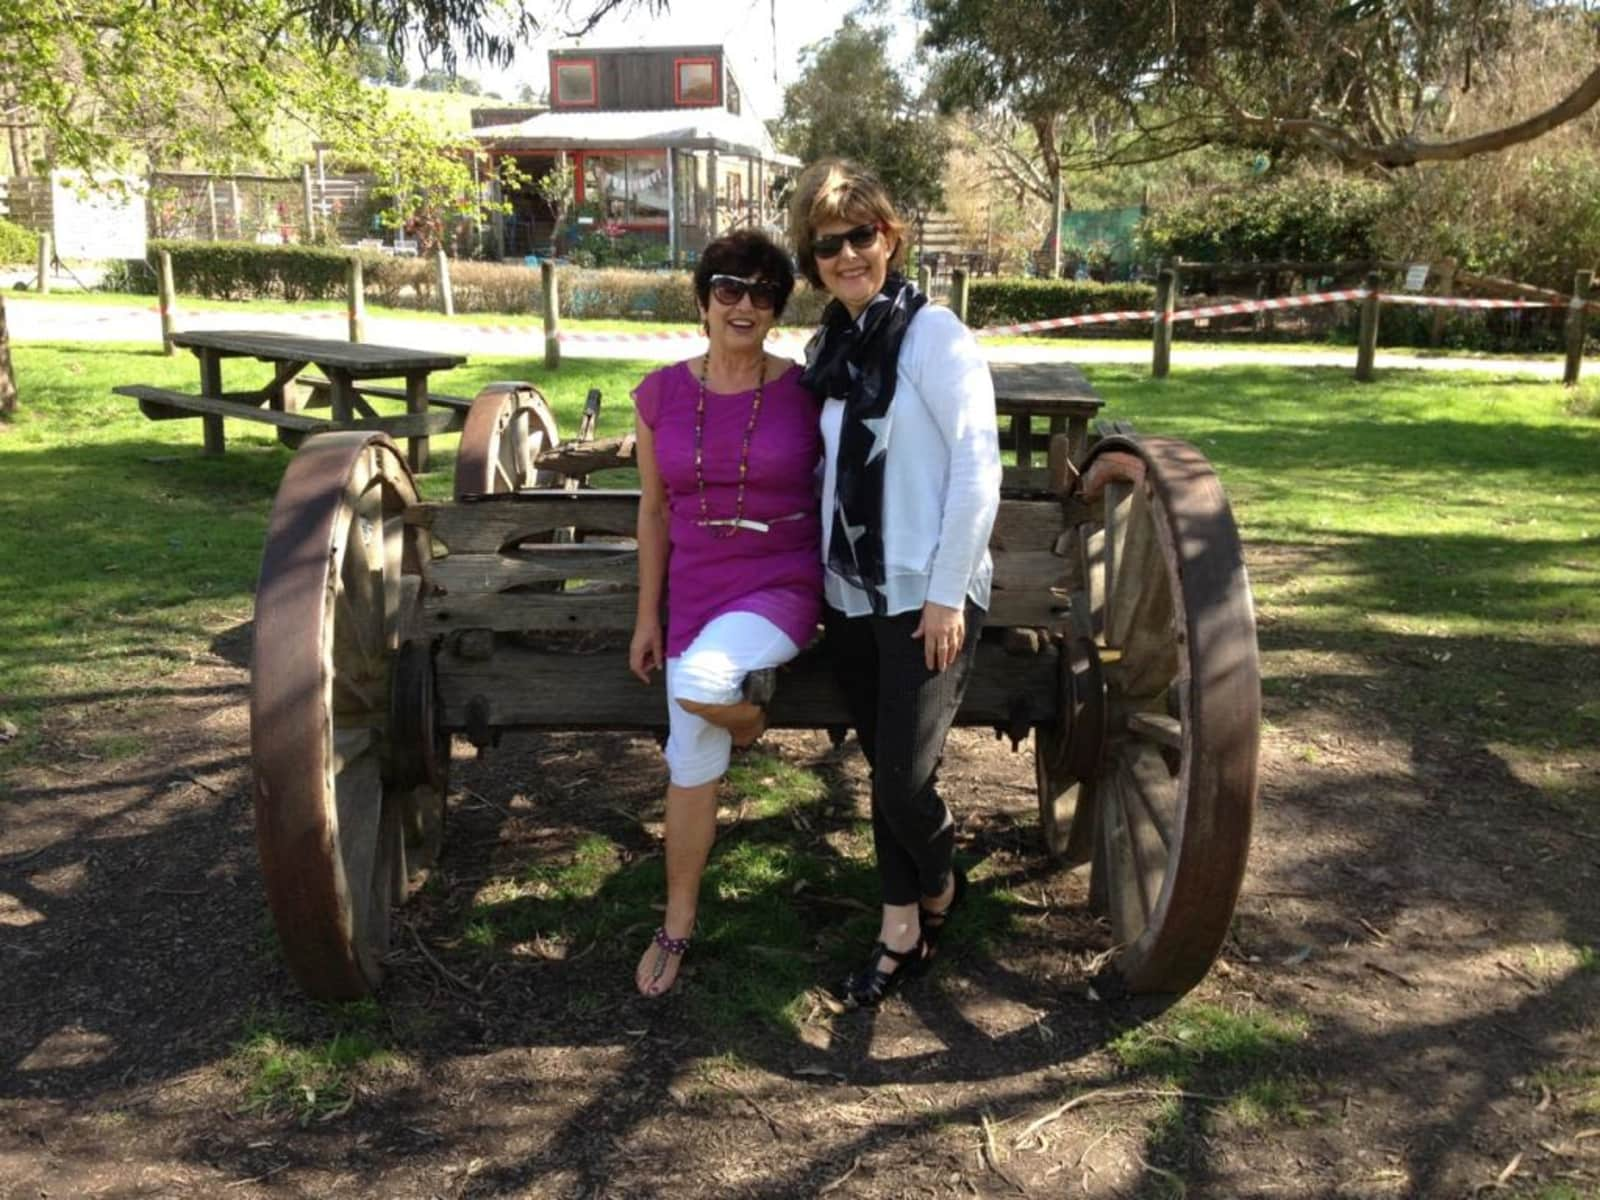 Roslyn from Mount Martha, Victoria, Australia